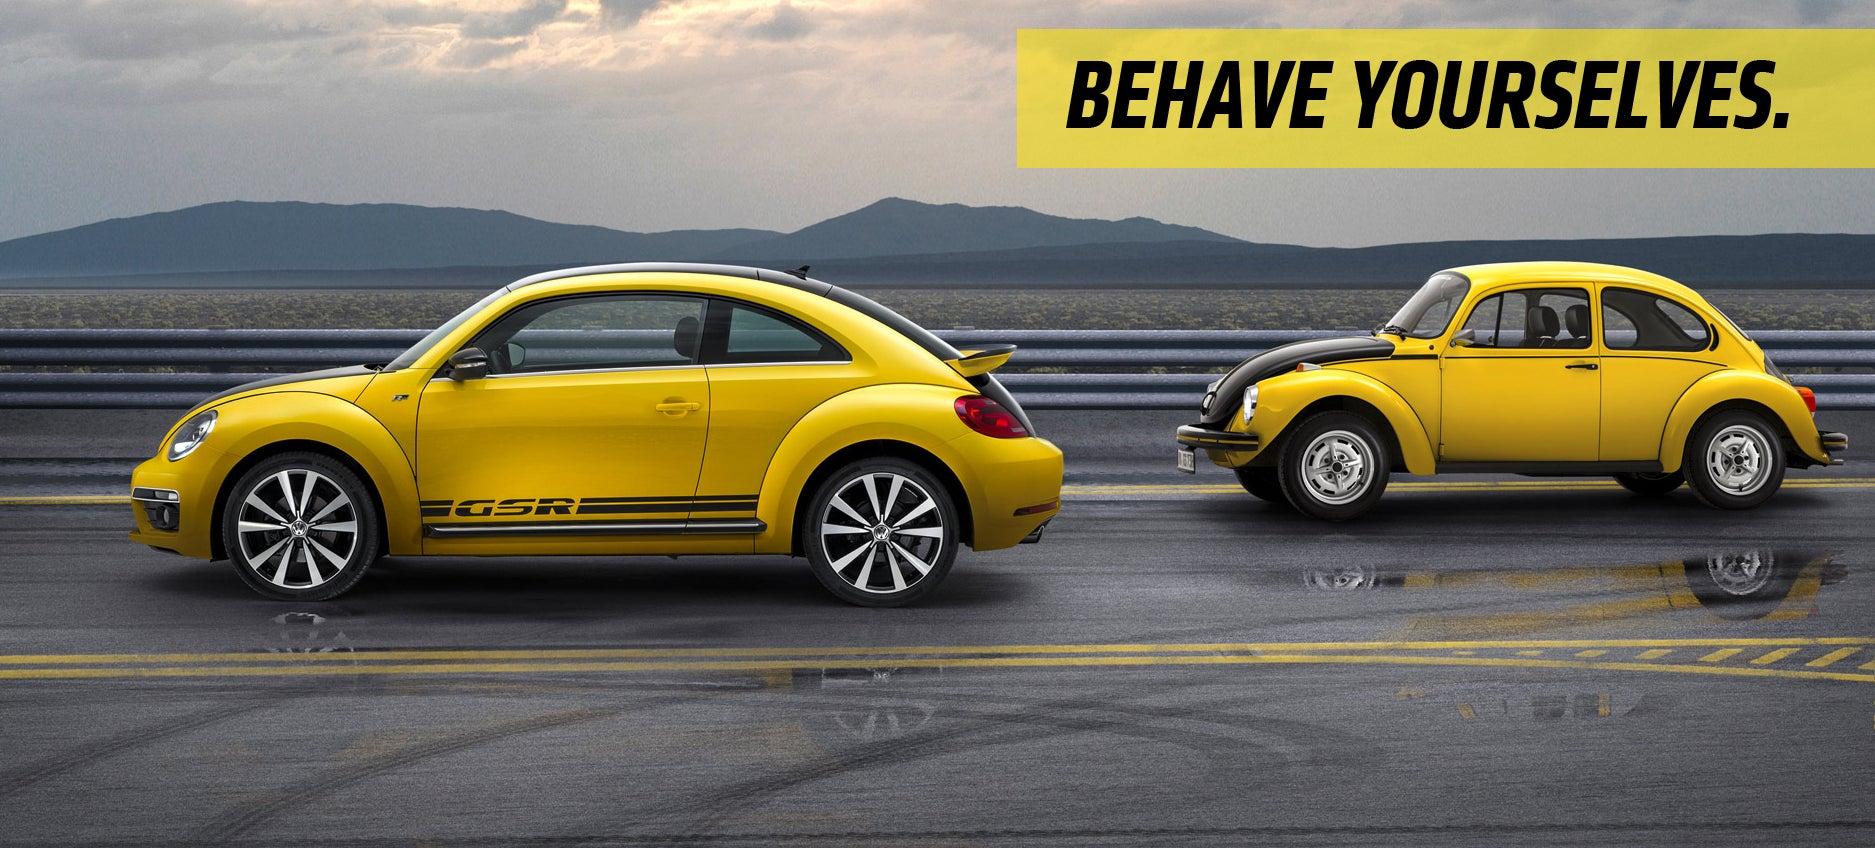 The Original Volkswagen Beetle Gsr Was Denounced As A